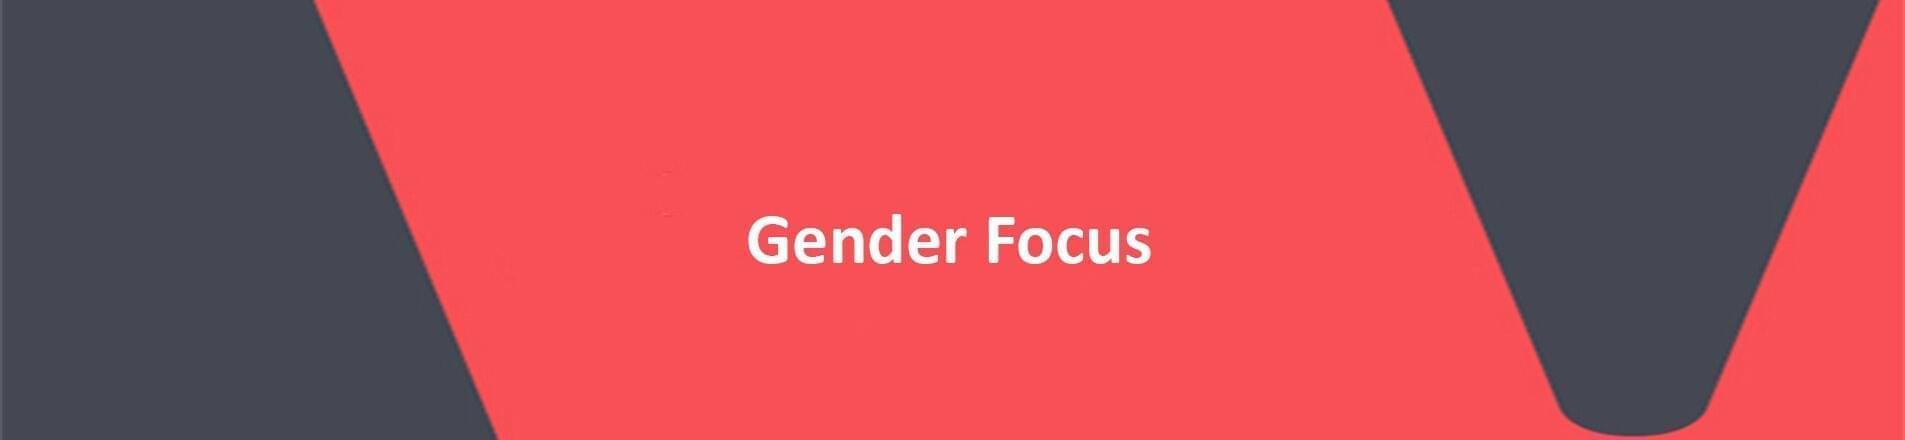 Gender Focus on red VERCIDA bakground